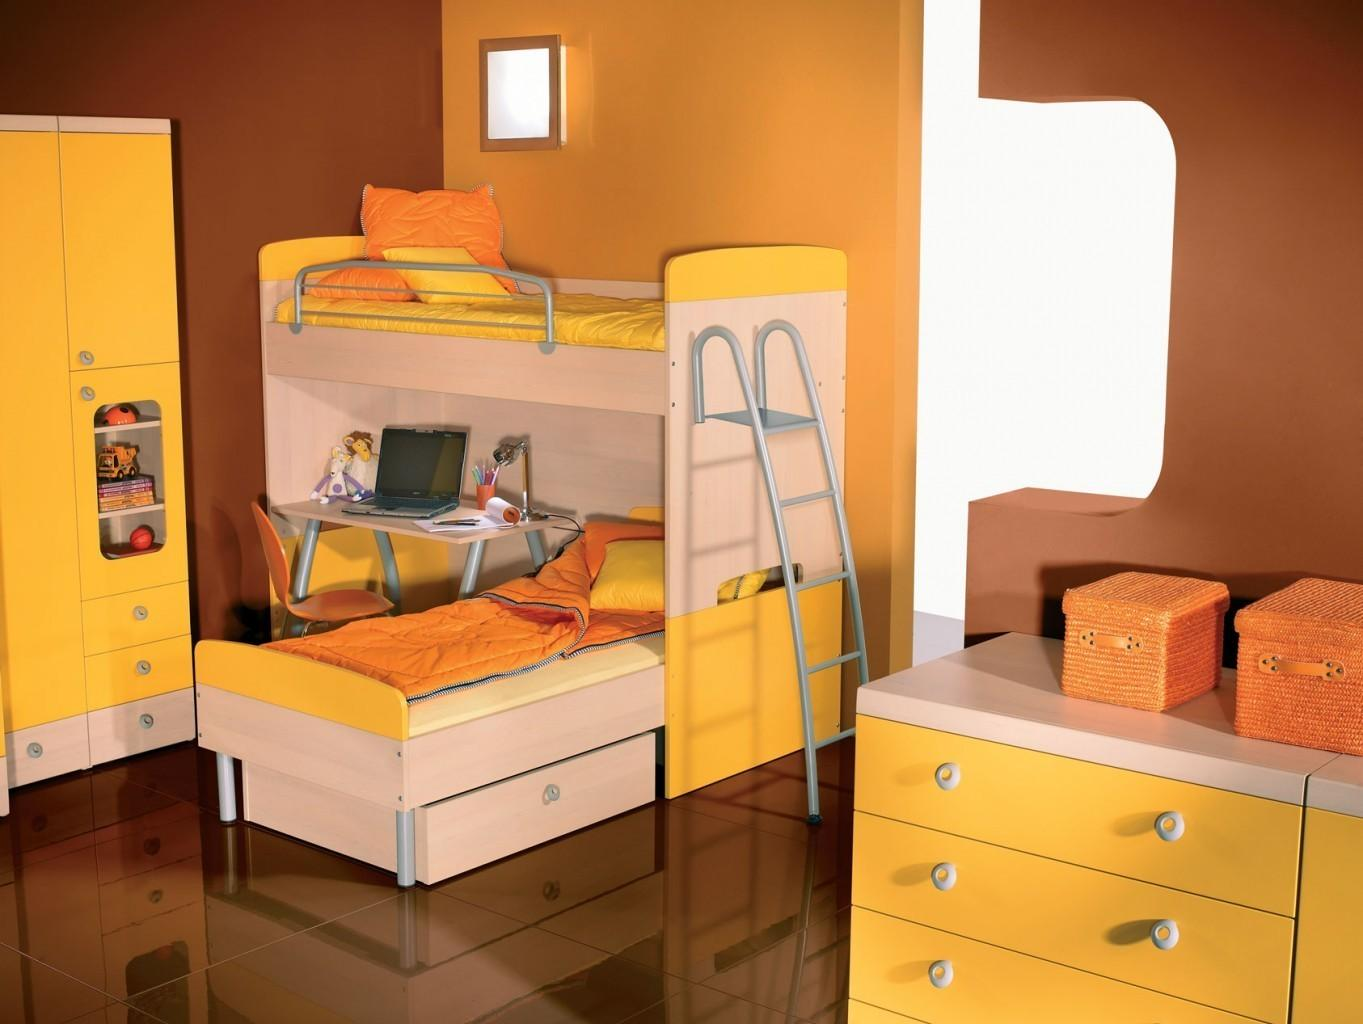 Otroška postelja - pograd